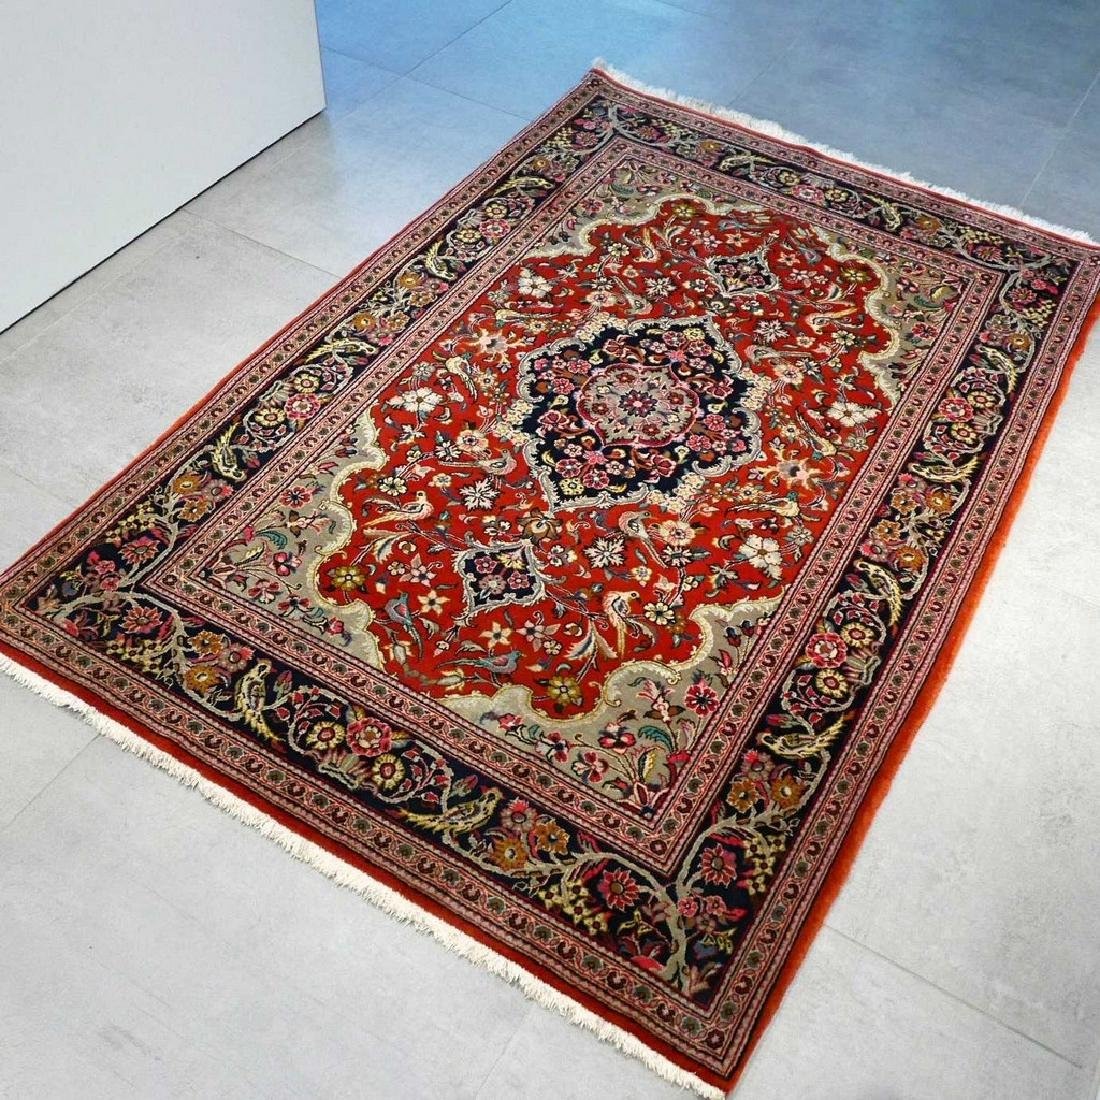 Qum Kork Wool on Cotton Rug 5.4x3.6 - 7